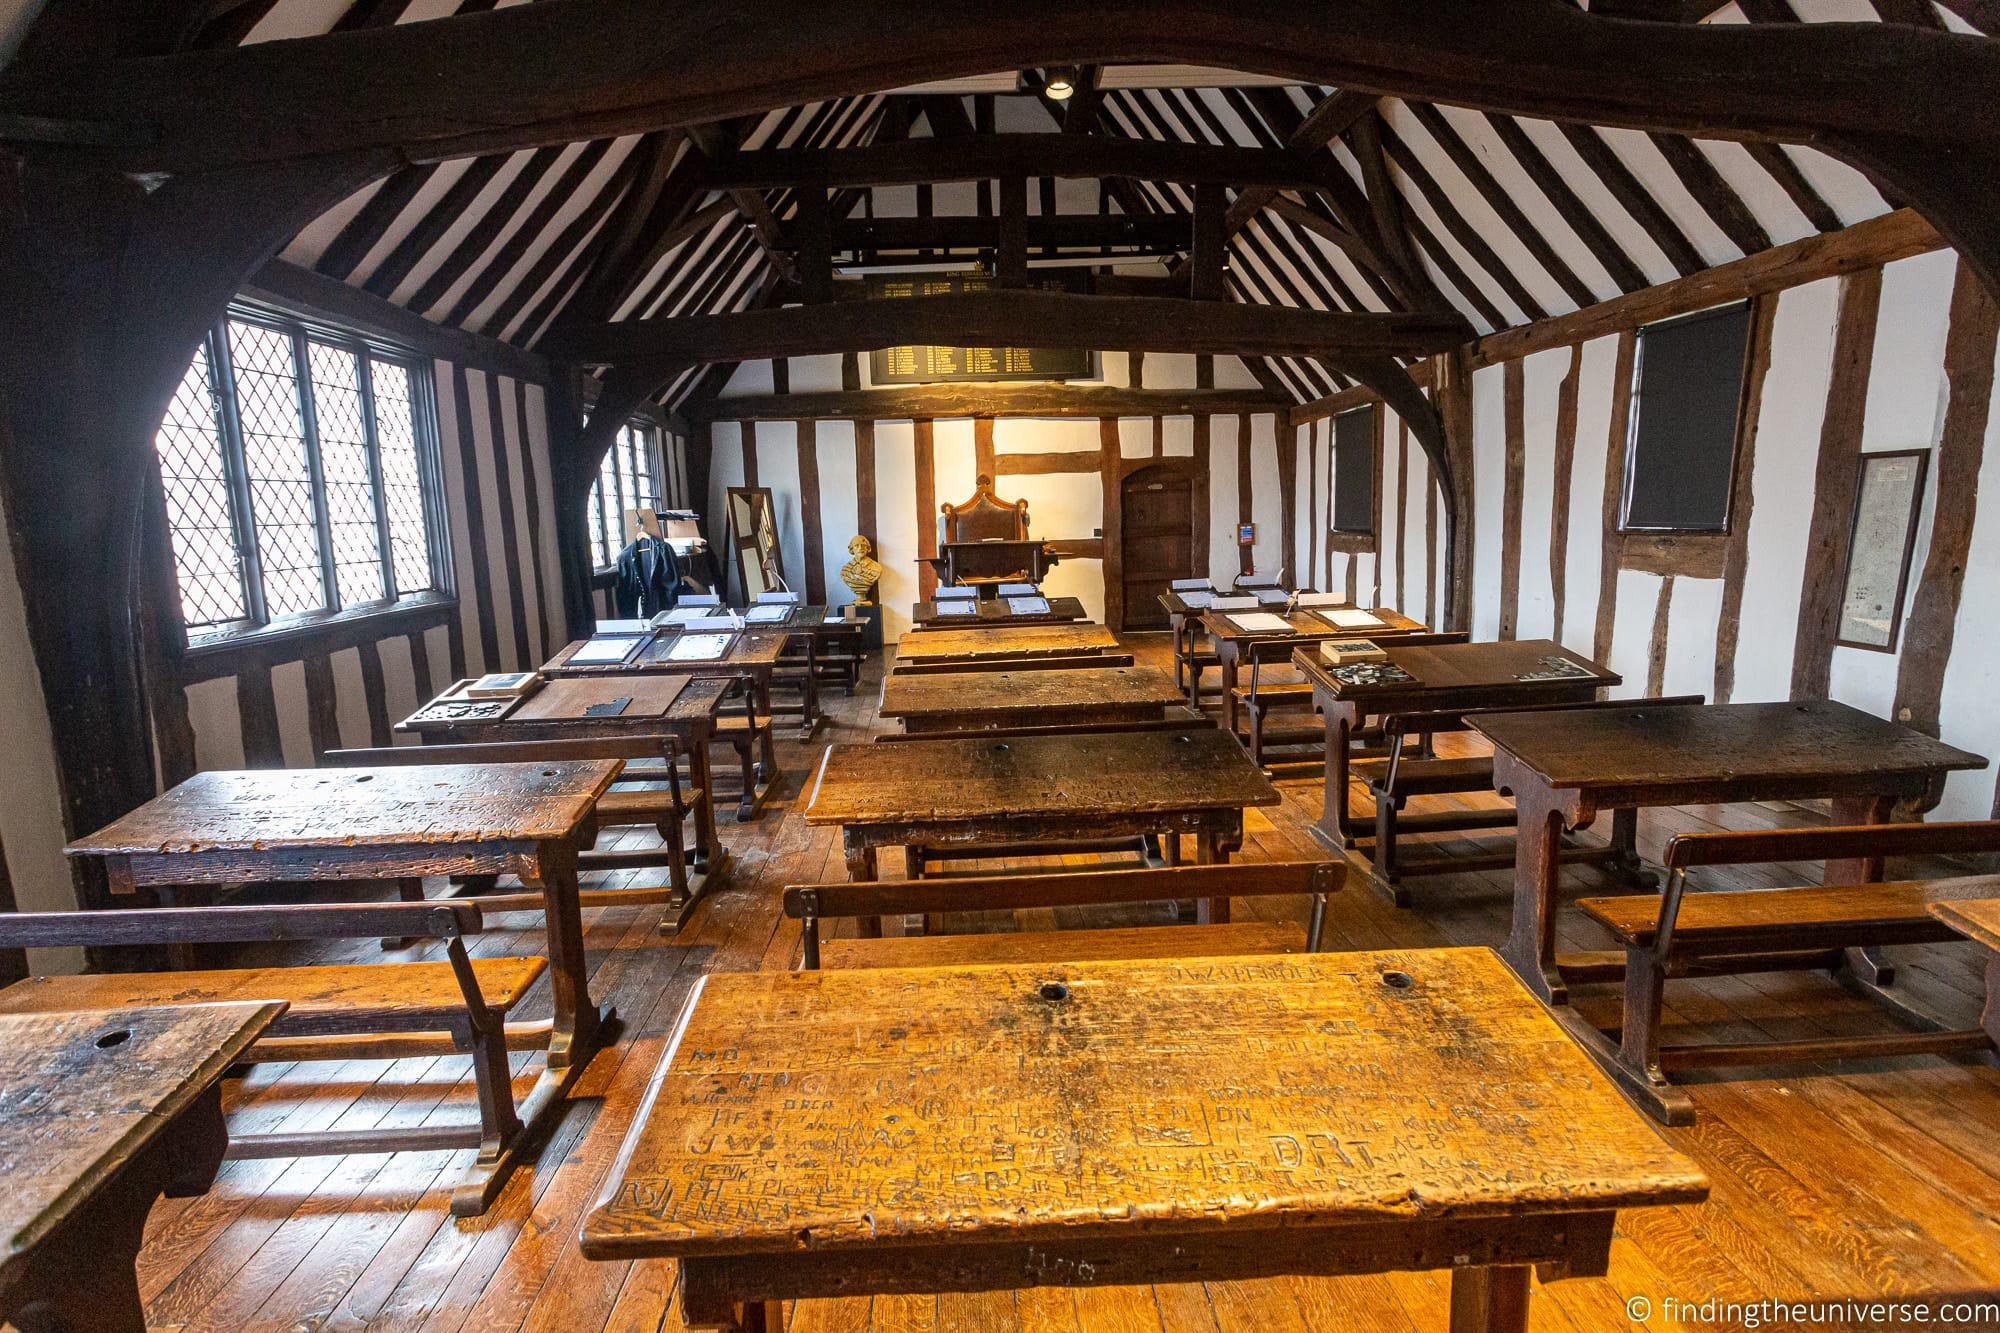 Shakespeare's Schoolroom & Guildhall Stratford-Upon-Avon